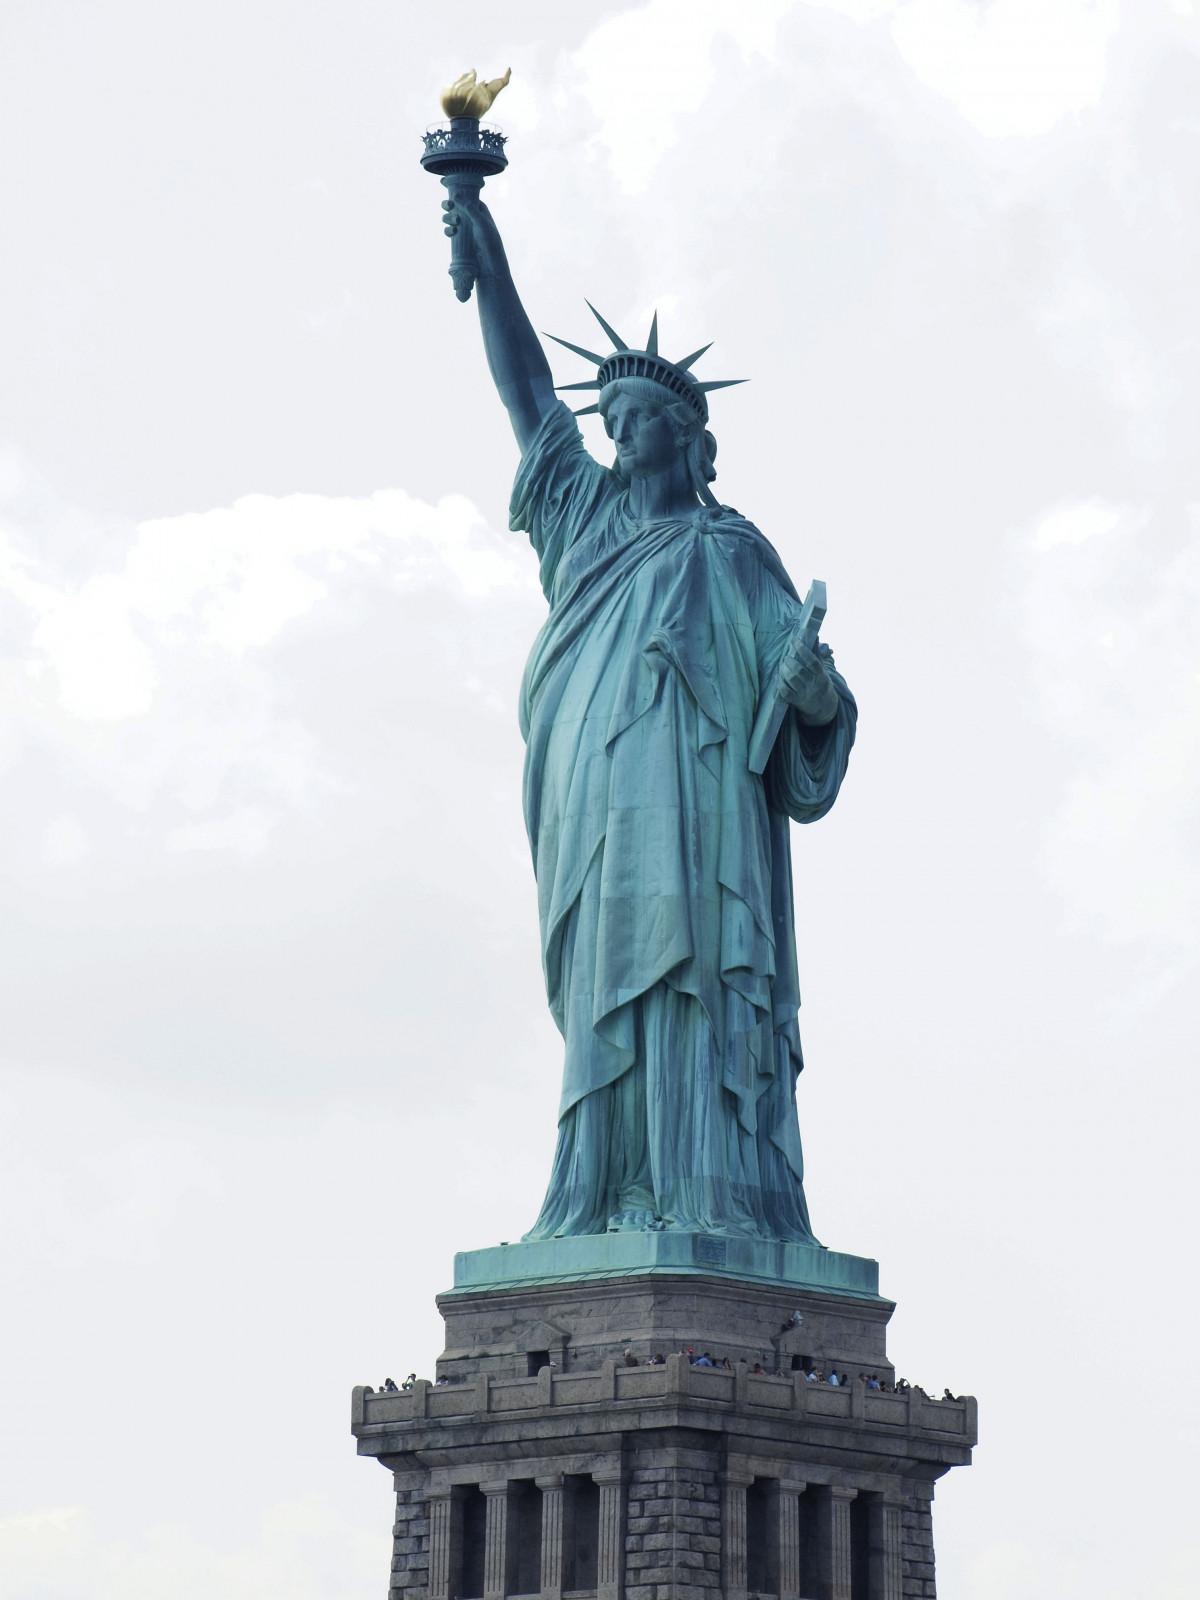 statue_of_liberty_statue_liberty_landmar